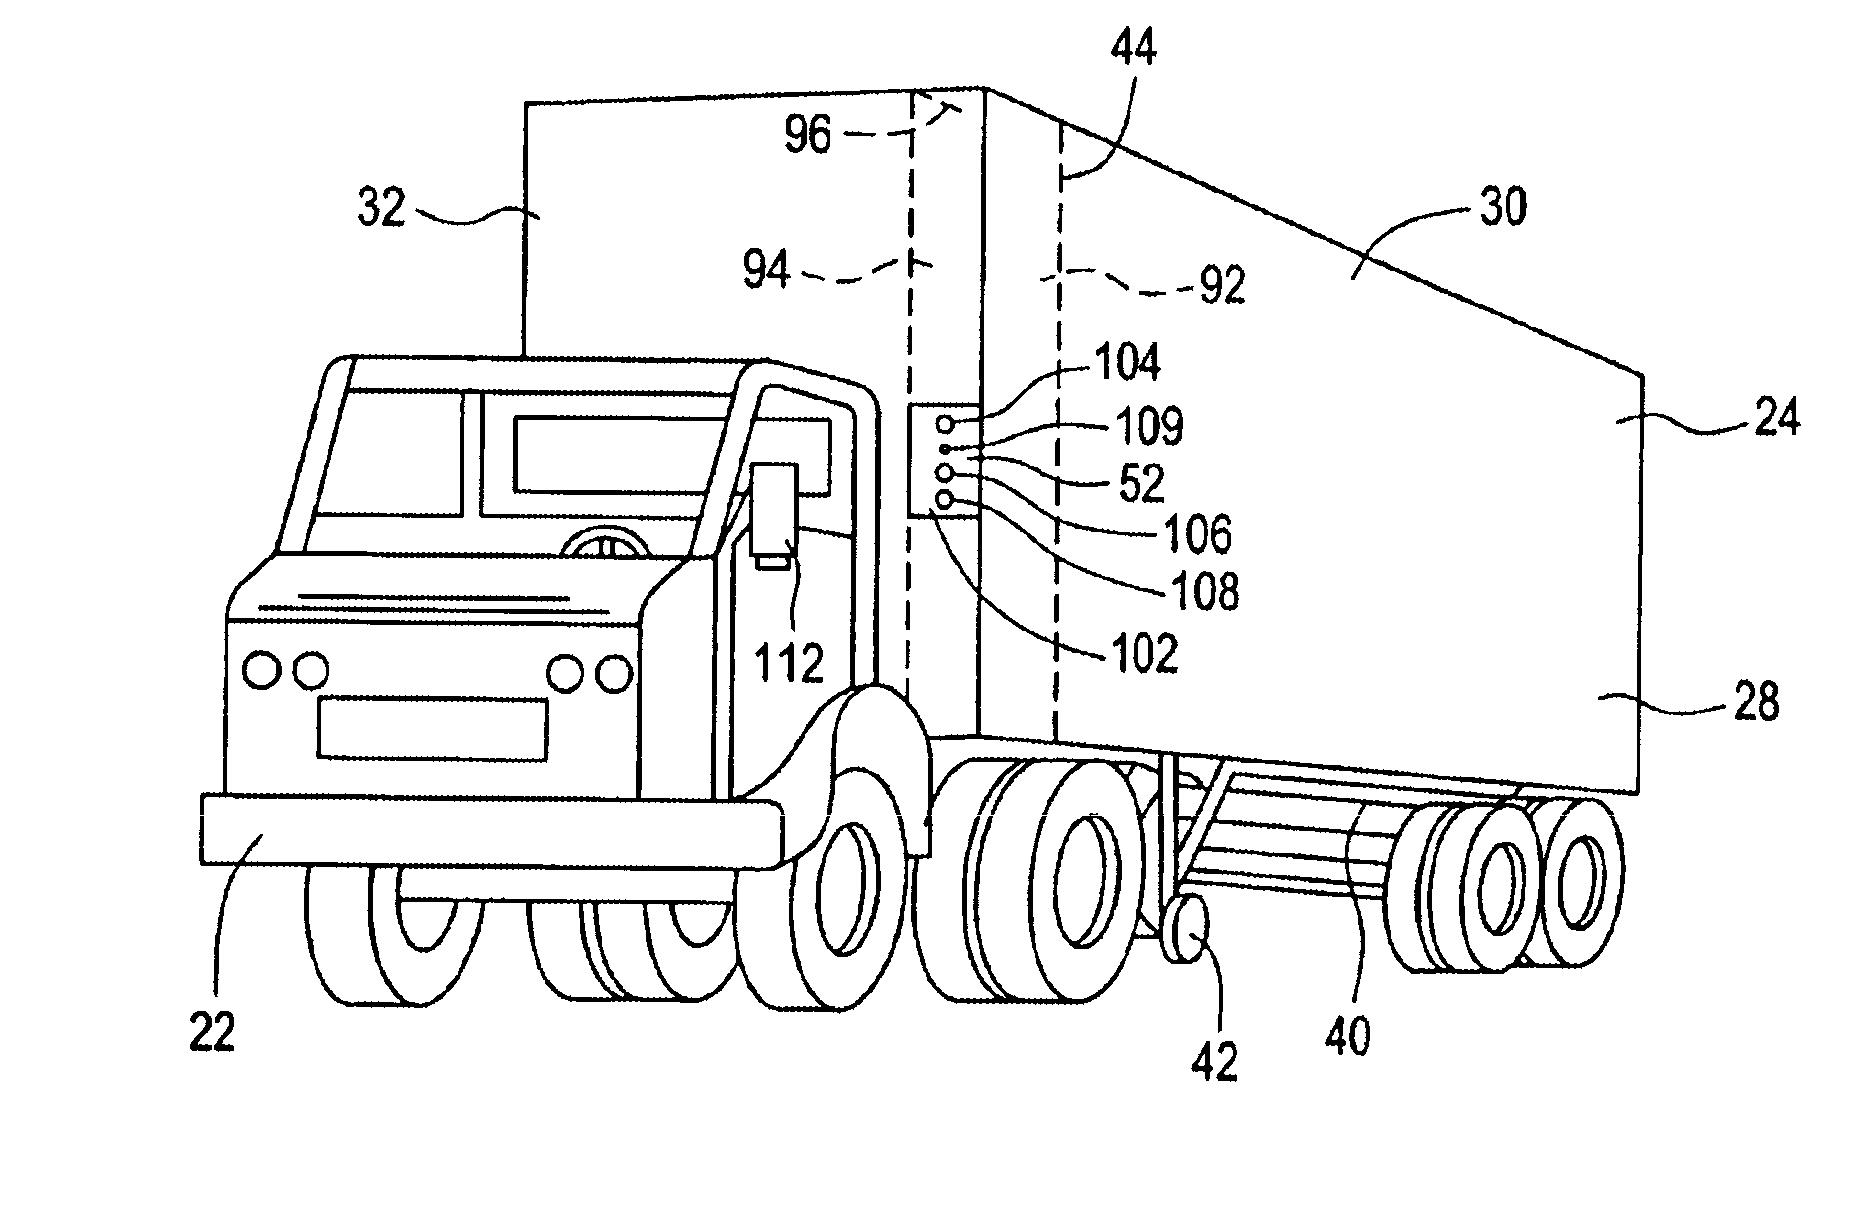 Semi Truck Light Diagram - Schema Wiring Diagram - Semi Trailer Wiring Diagram